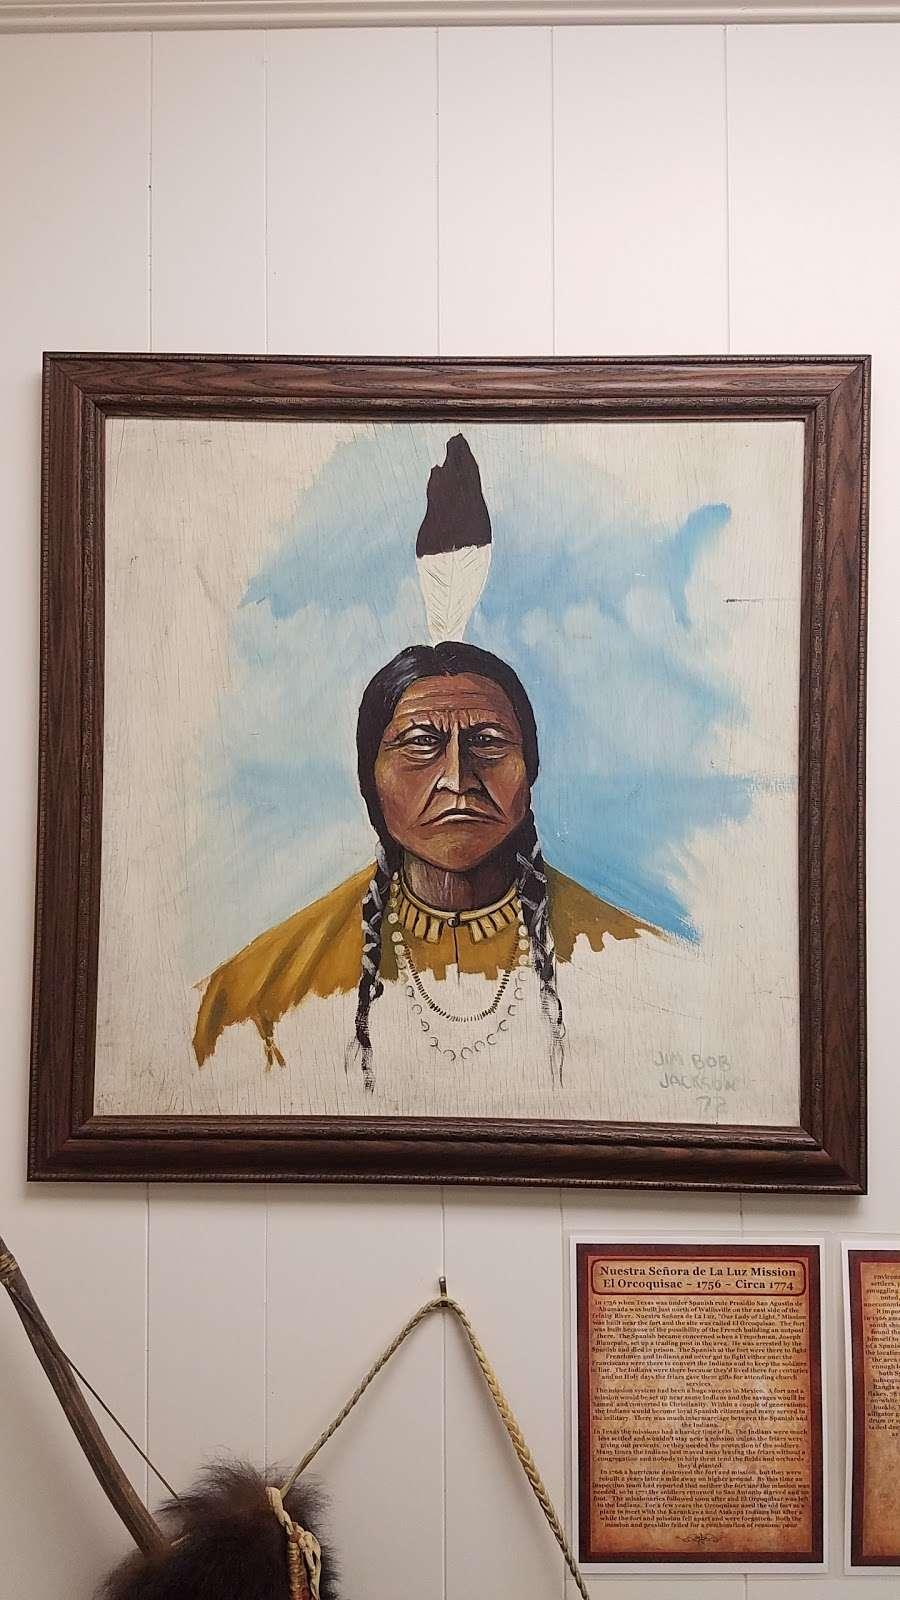 Chambers County Museum at Wallisville - museum  | Photo 4 of 10 | Address: 20136 I-10, Wallisville, TX 77597, USA | Phone: (409) 389-2252